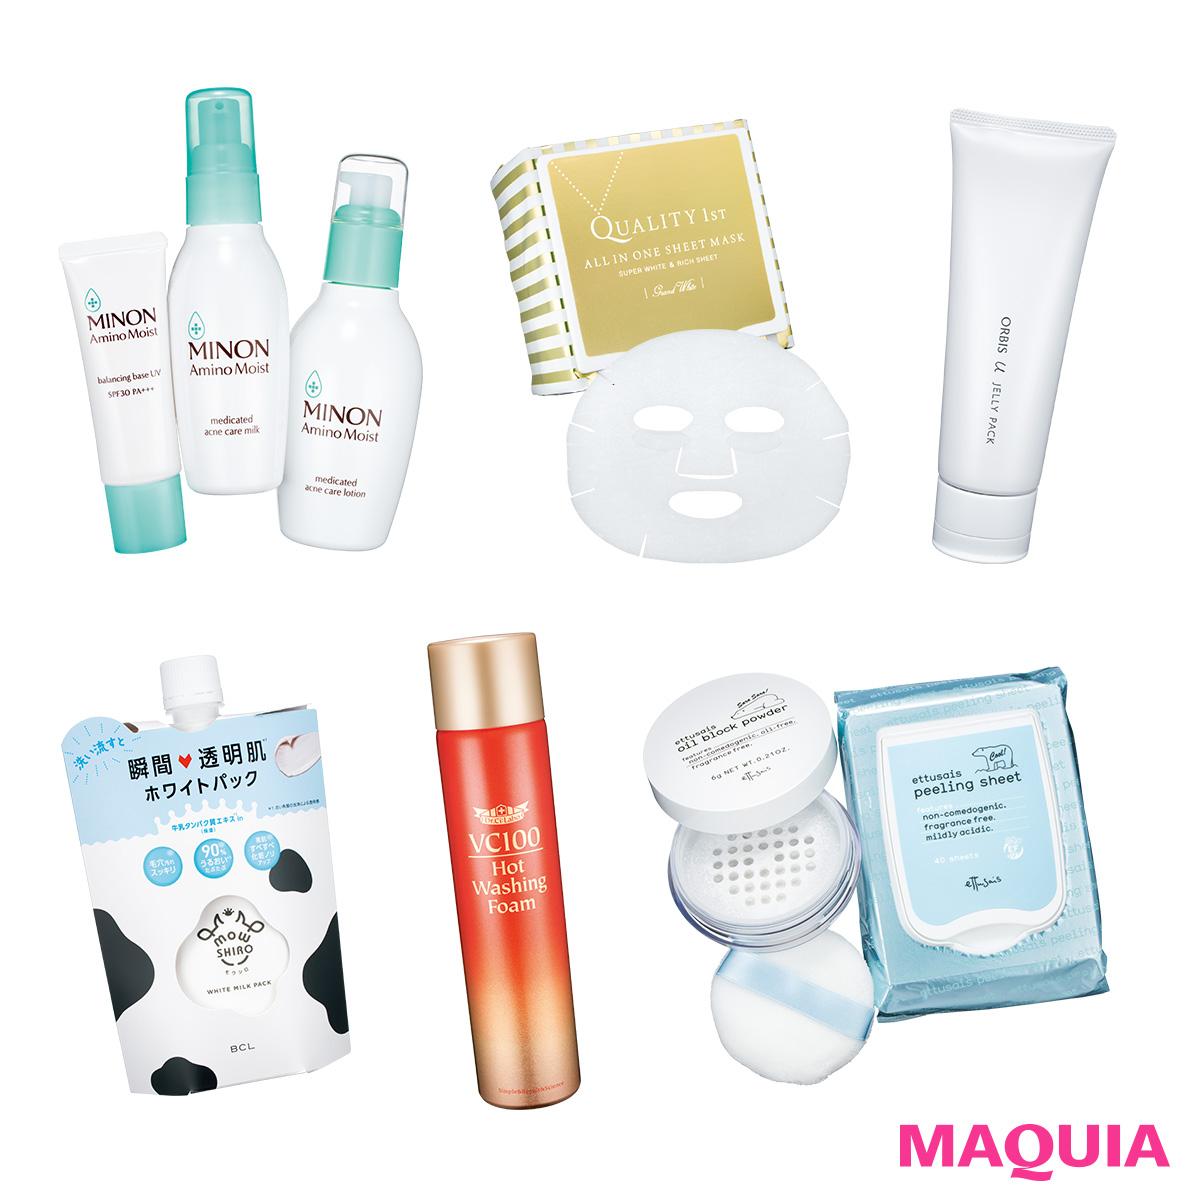 【ALL2,000円以下】洗顔料や化粧水、シートマスクetc. プチプラ新作スキンケアアイテム6選